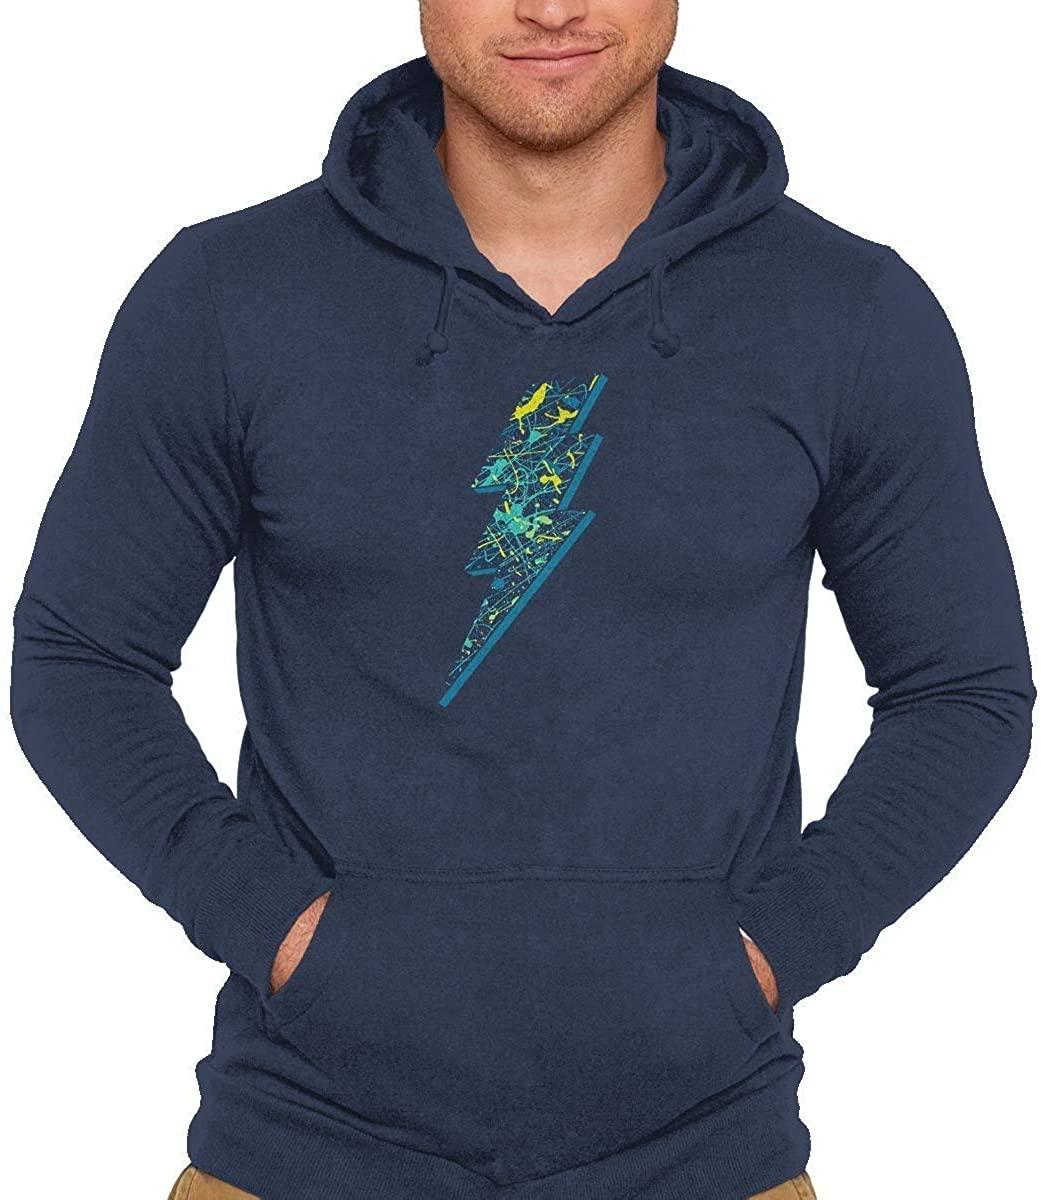 TeeFury Electric Paint - Unisex Pullover Sweatshirt